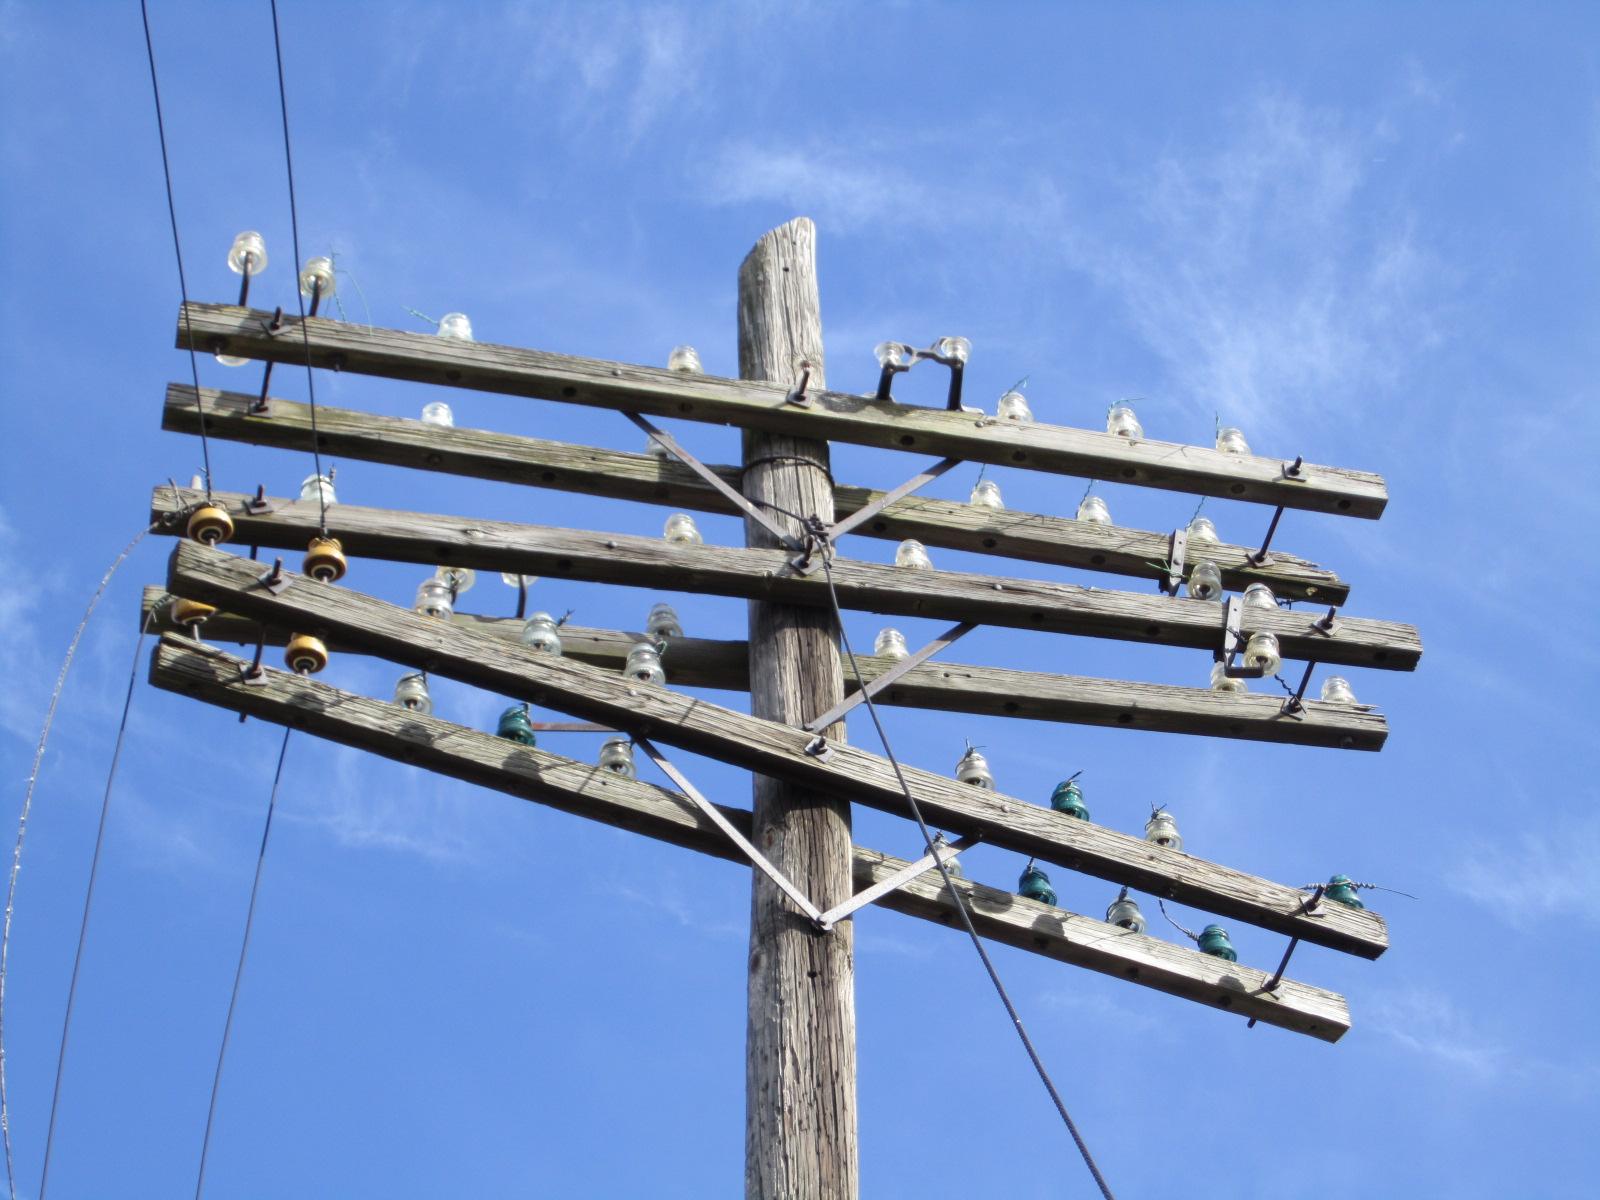 Recumbent conspiracy theorist insulators in the wild for Power line insulators glass